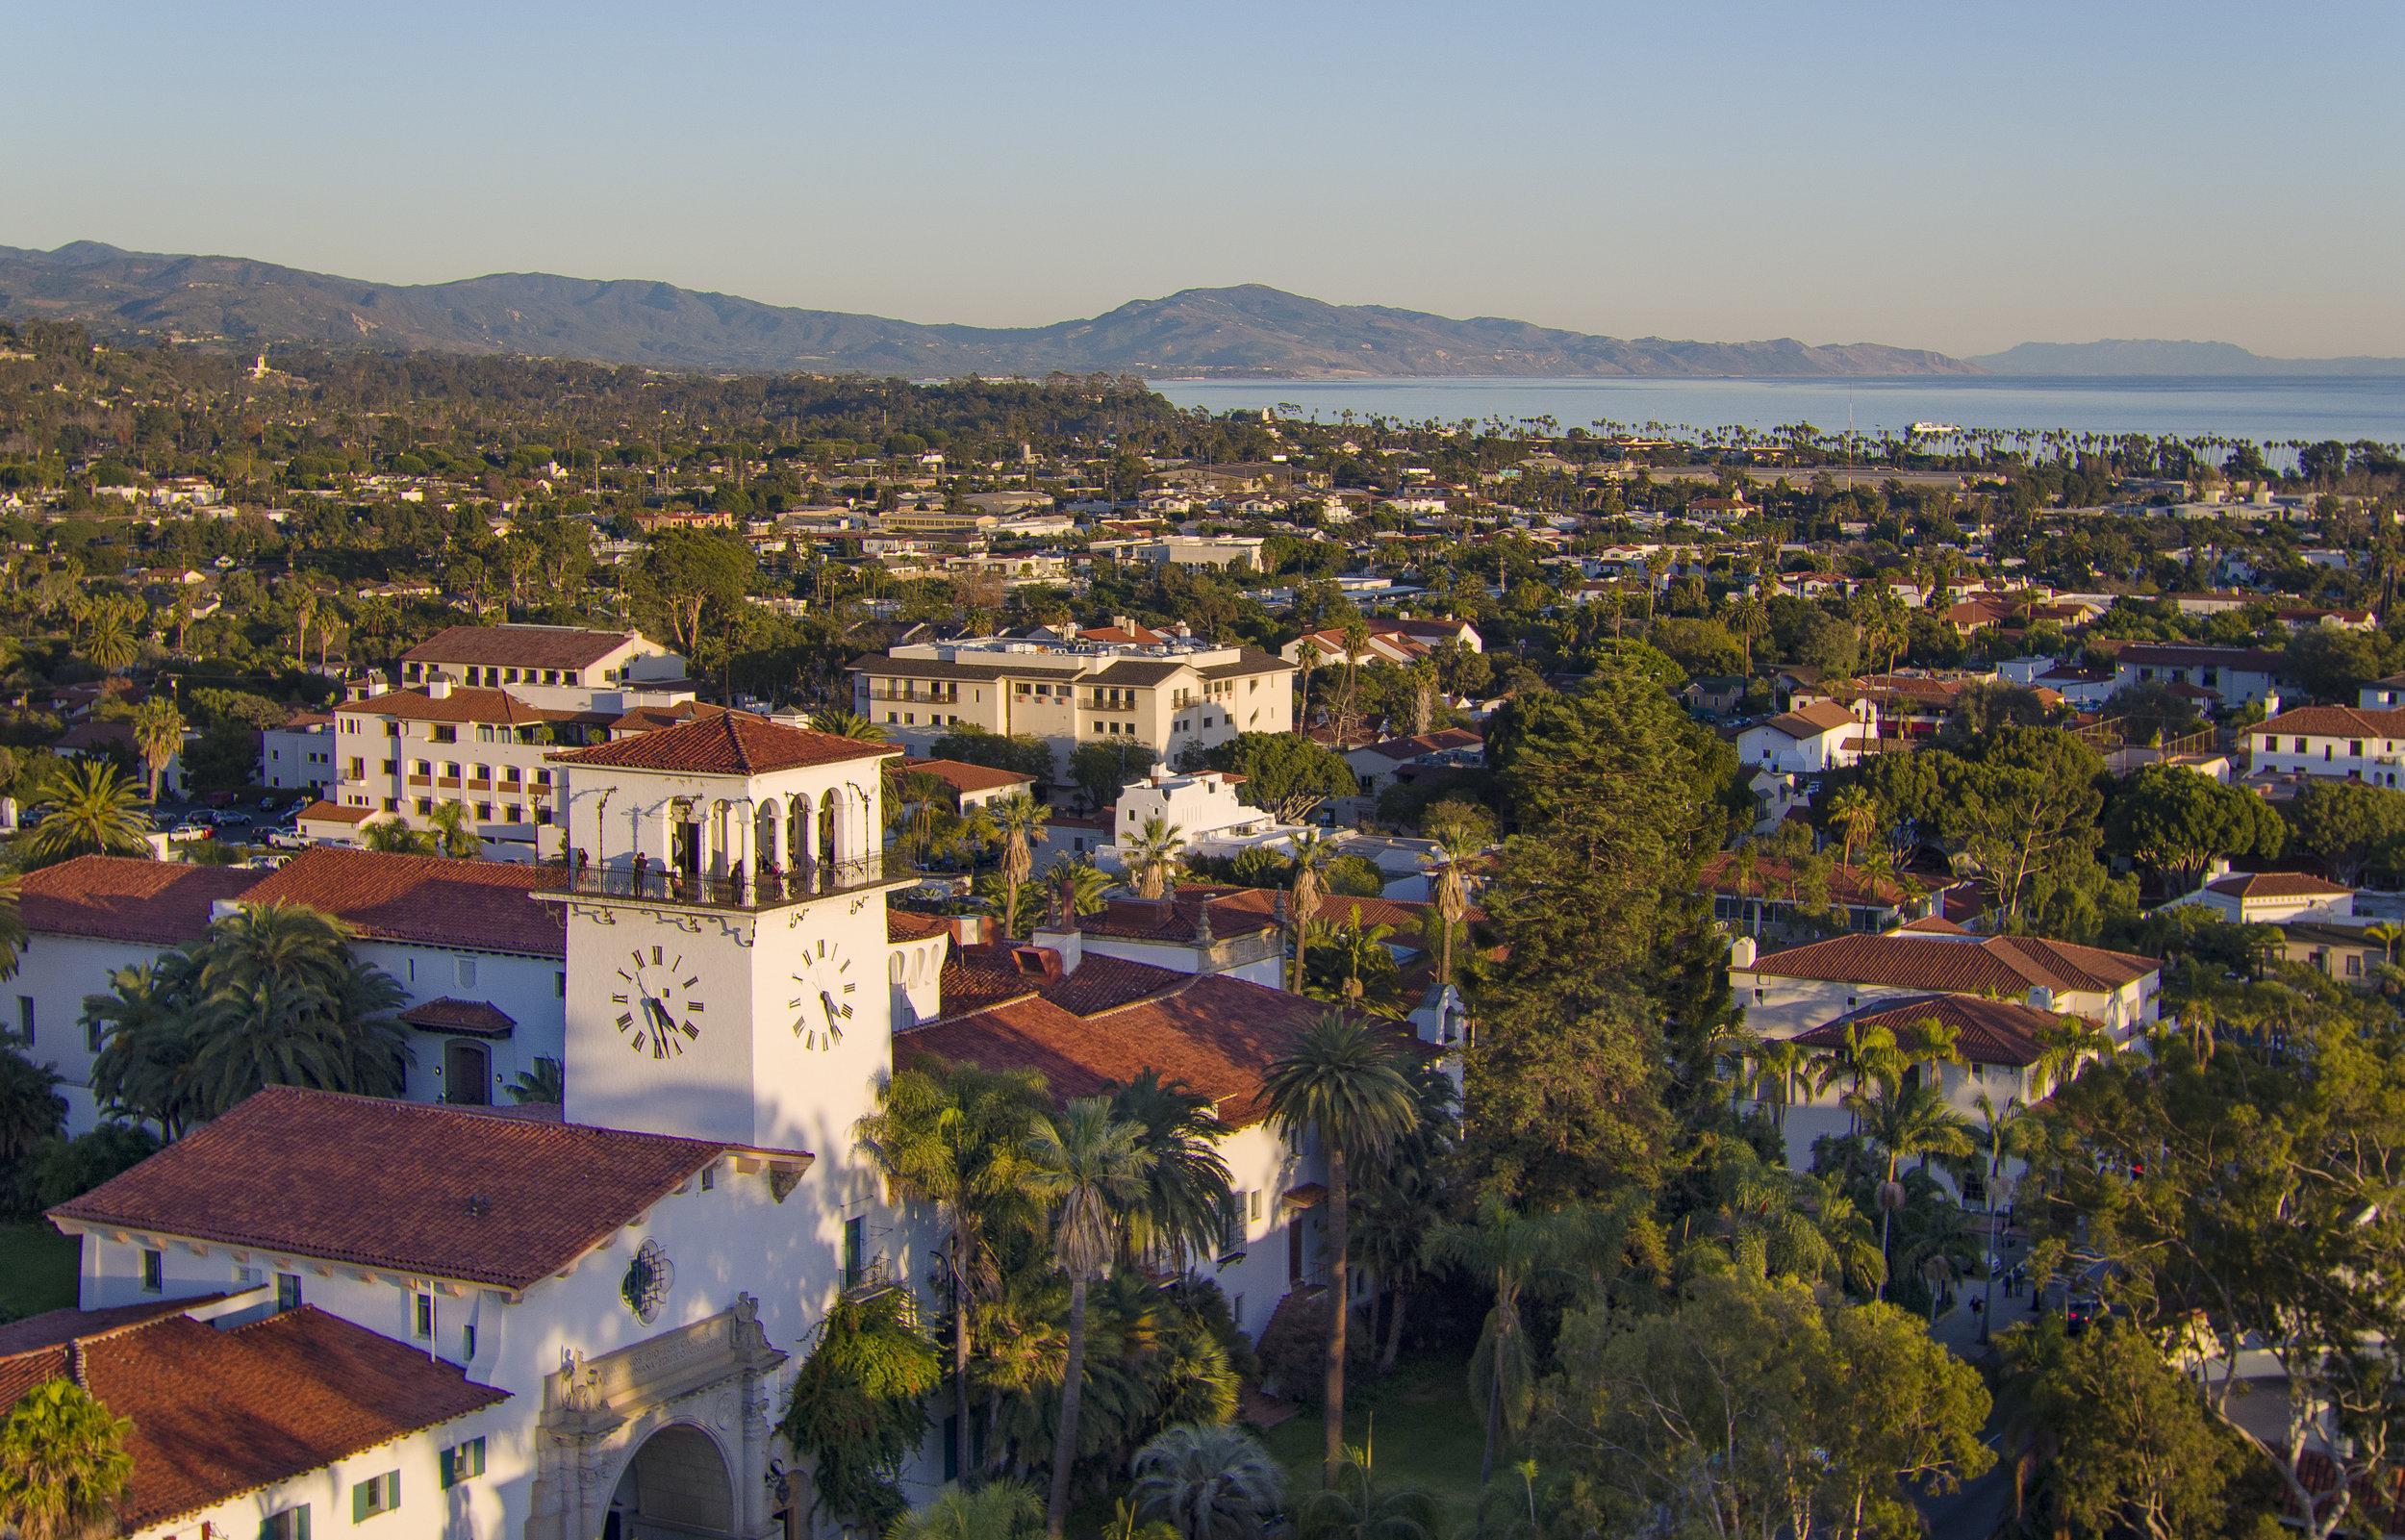 Downtown Santa Barbara Stock Image.jpg